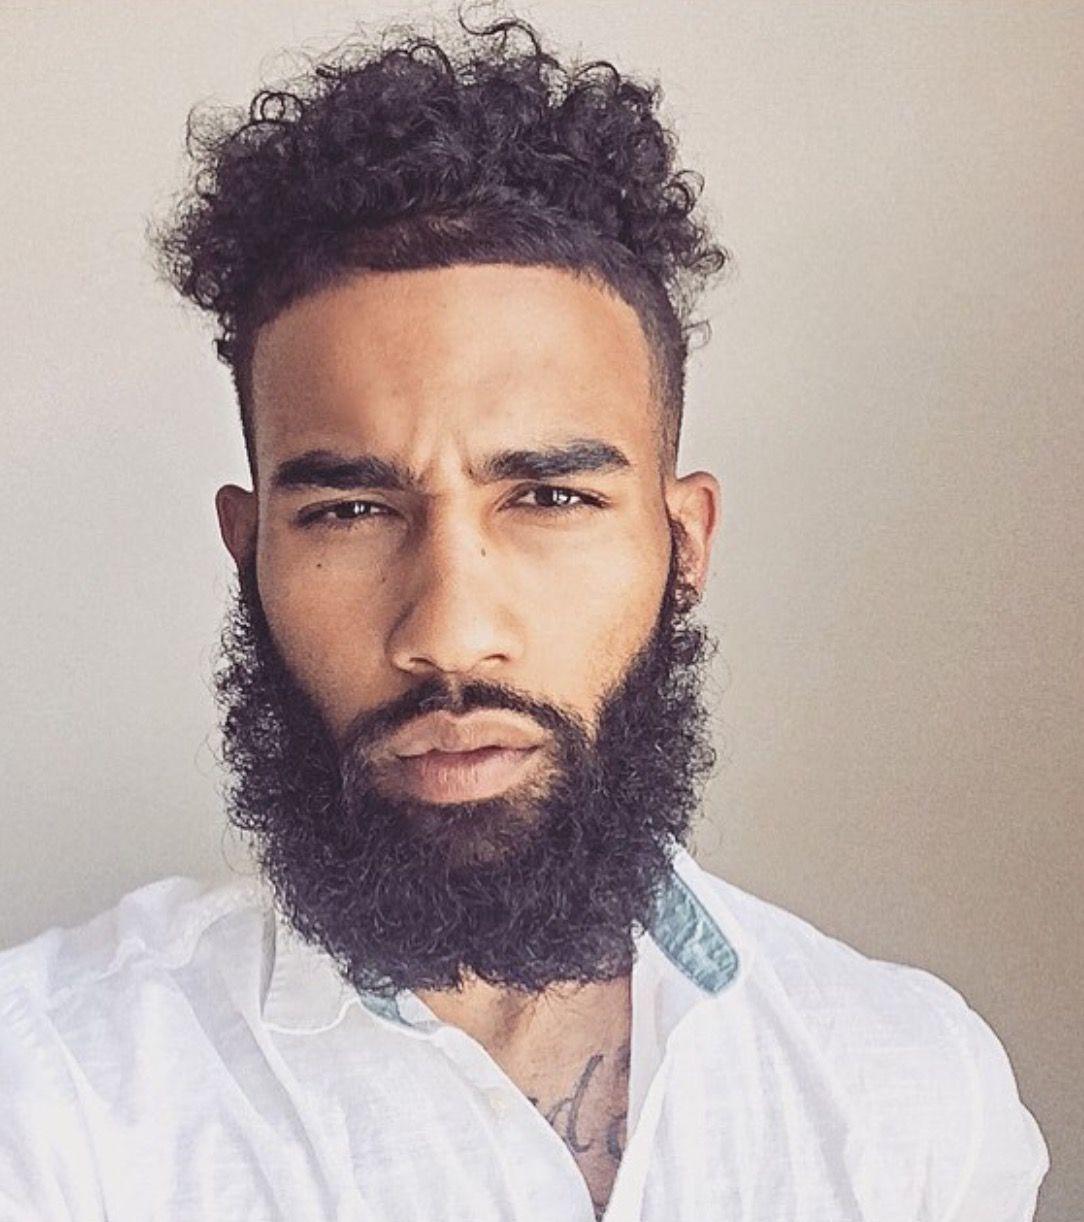 that beard beards pinterest black man beard game and man hair. Black Bedroom Furniture Sets. Home Design Ideas